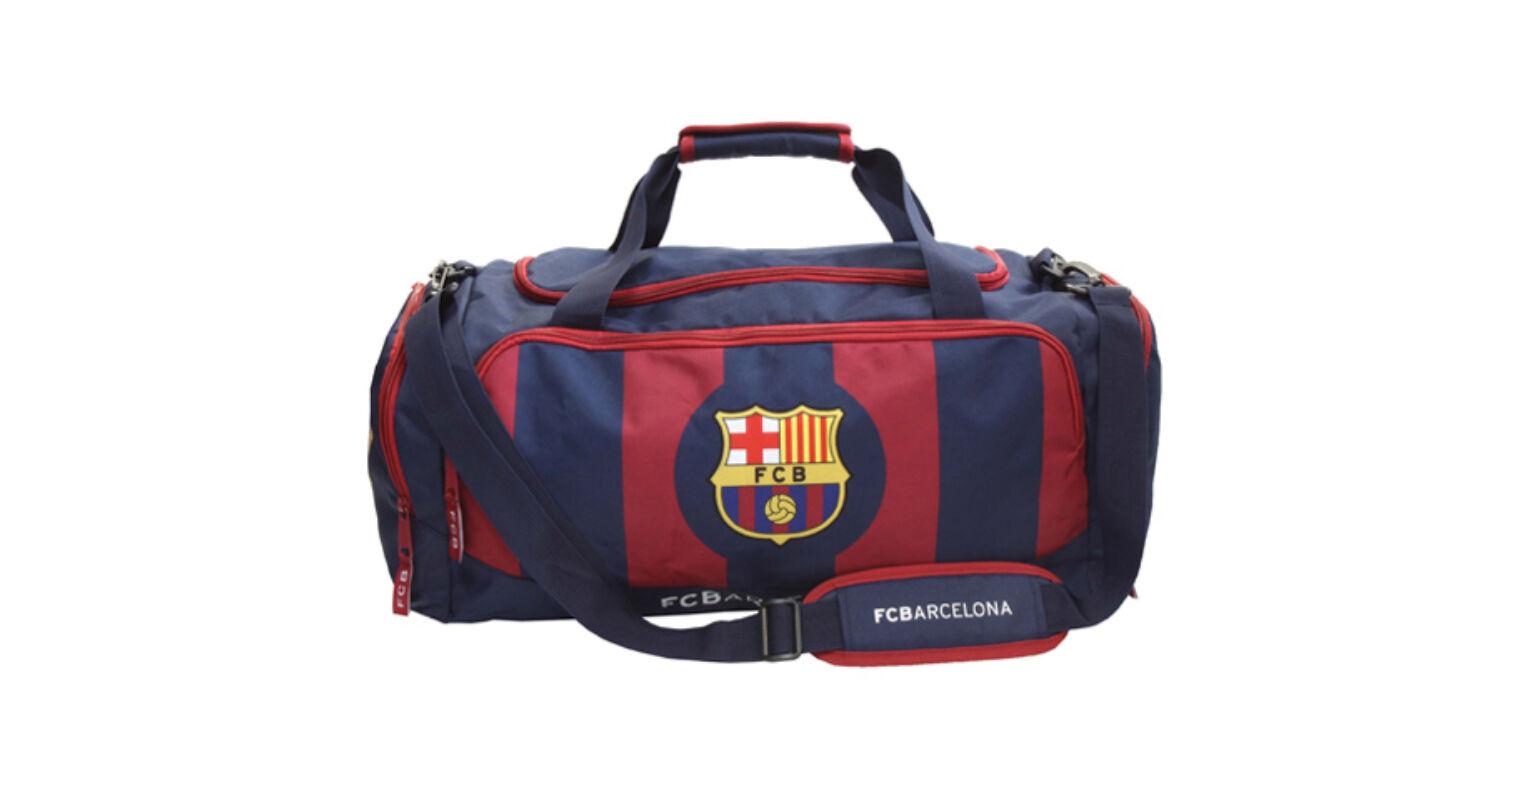 be676c6d02c6 FC Barcelona sporttáska 9.990 Ft-os áron!